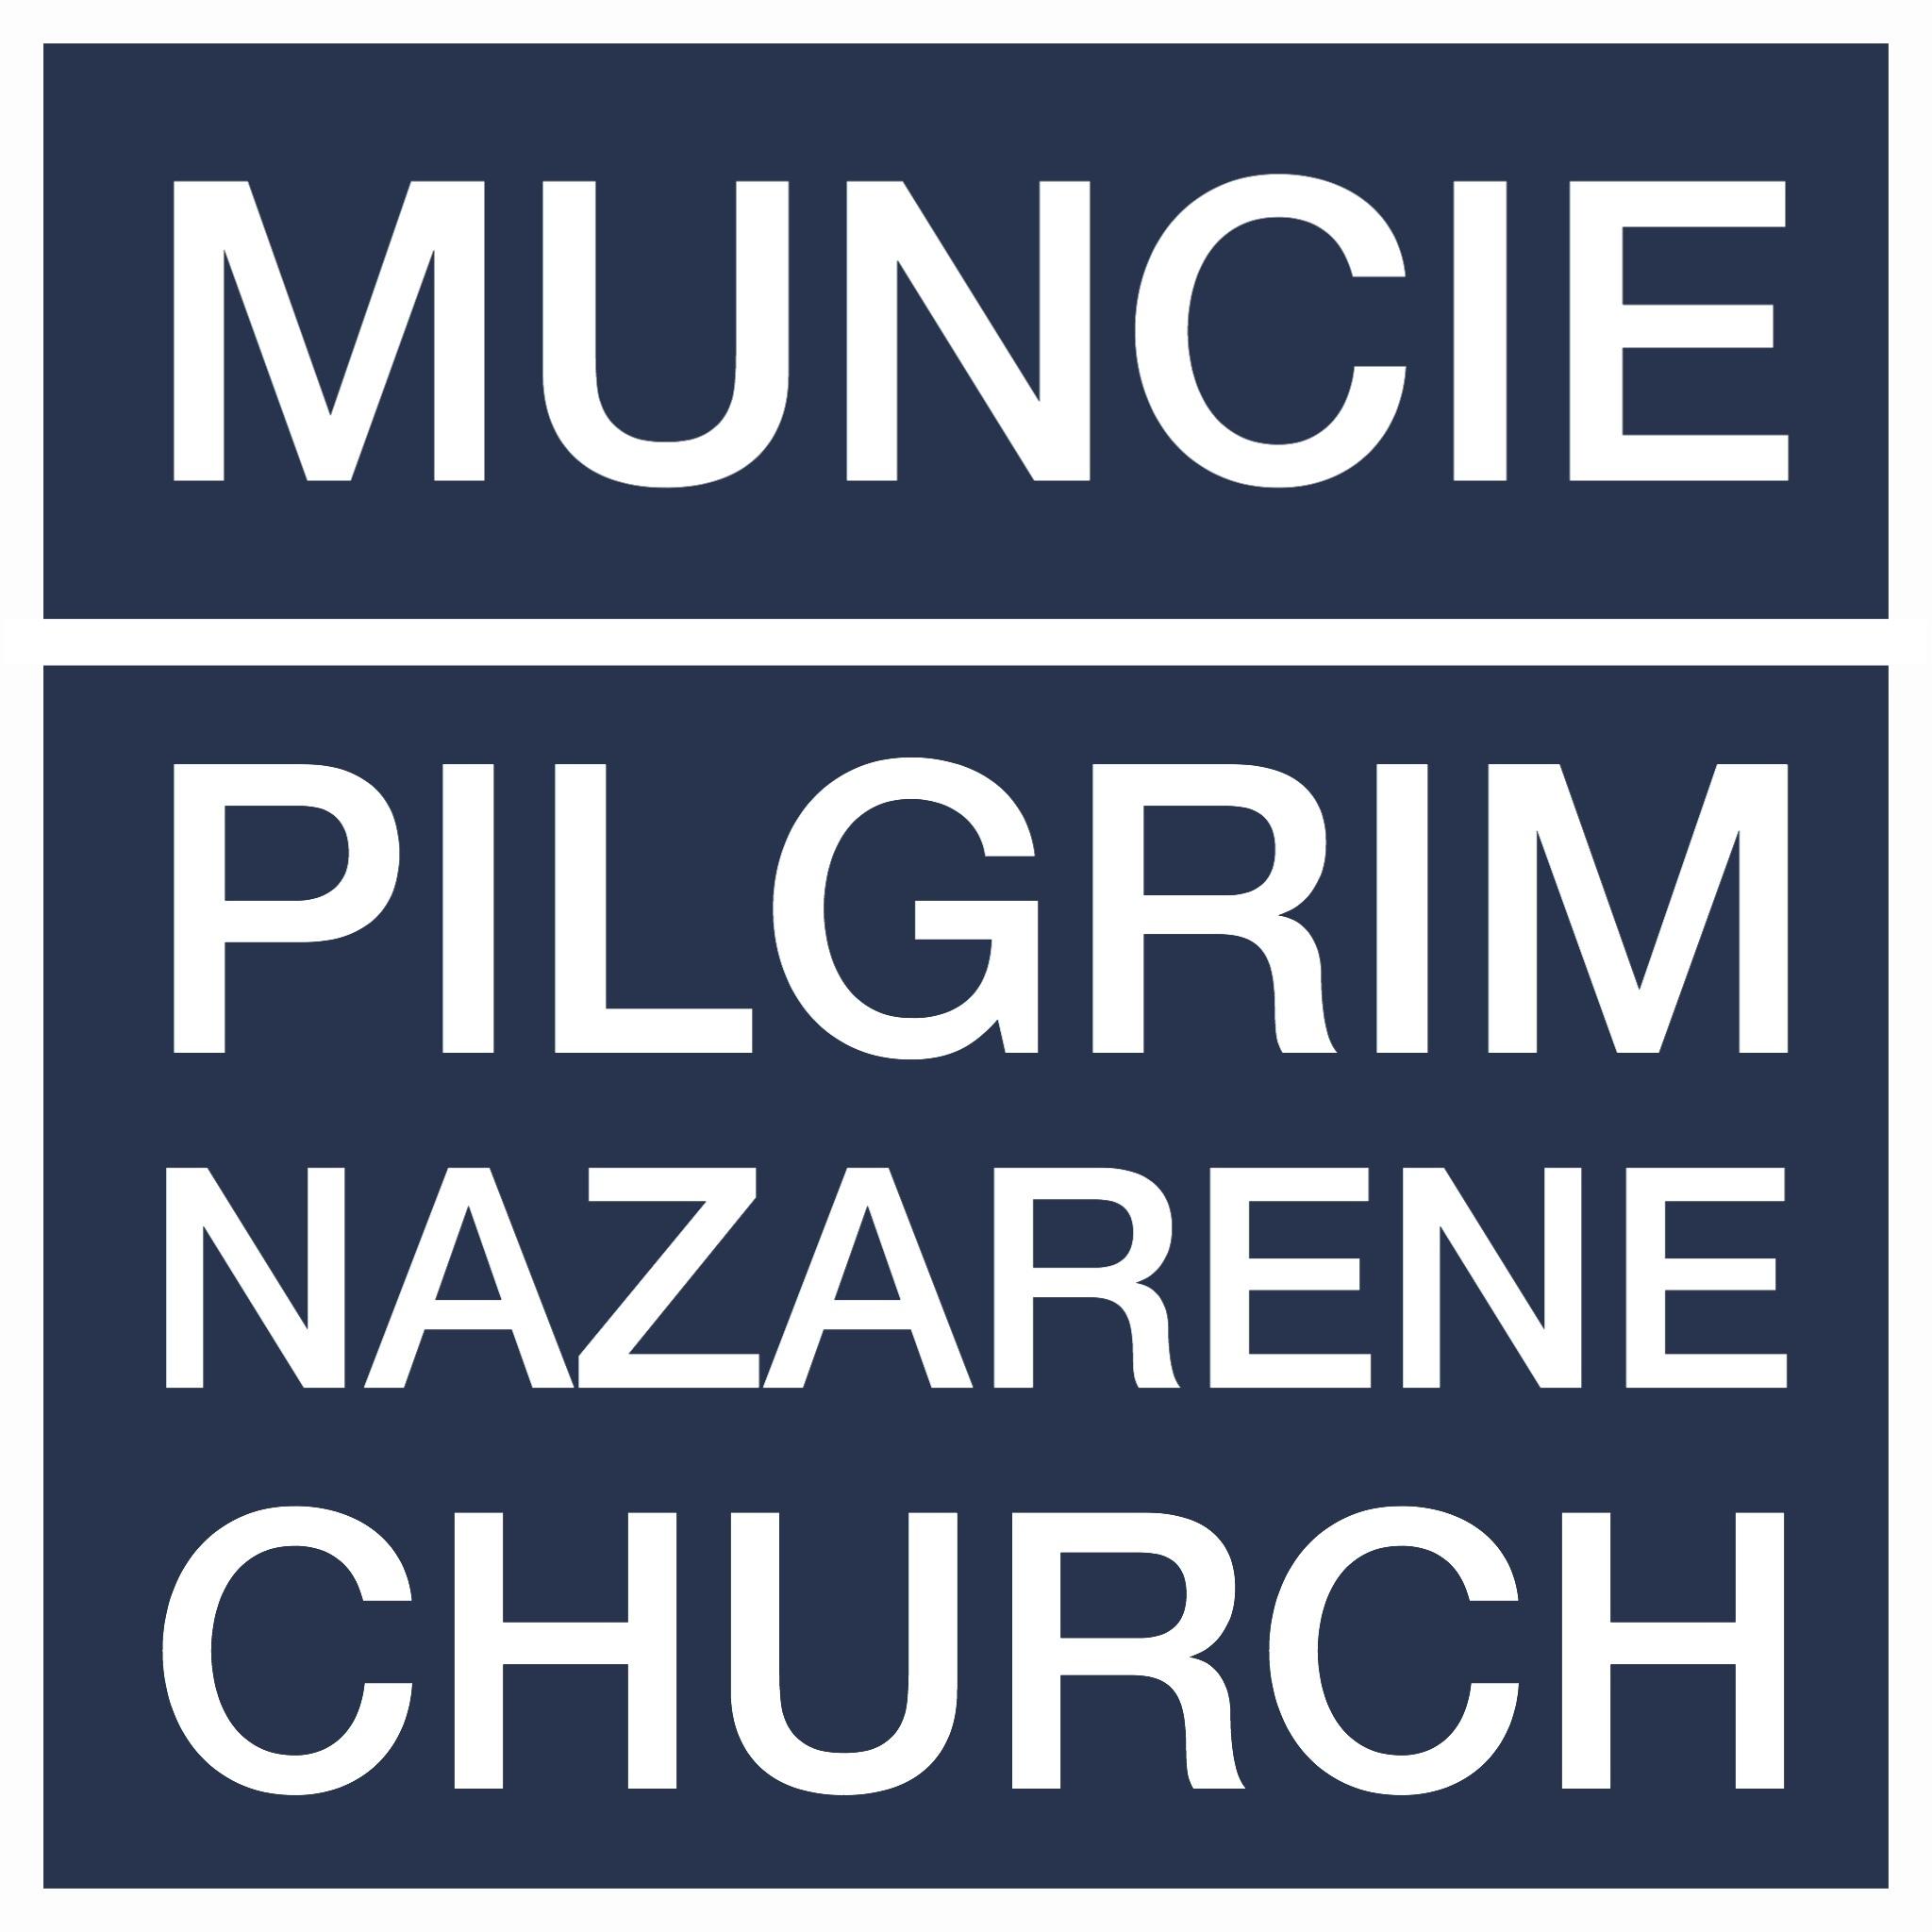 Muncie Pilgrim Nazarene Church